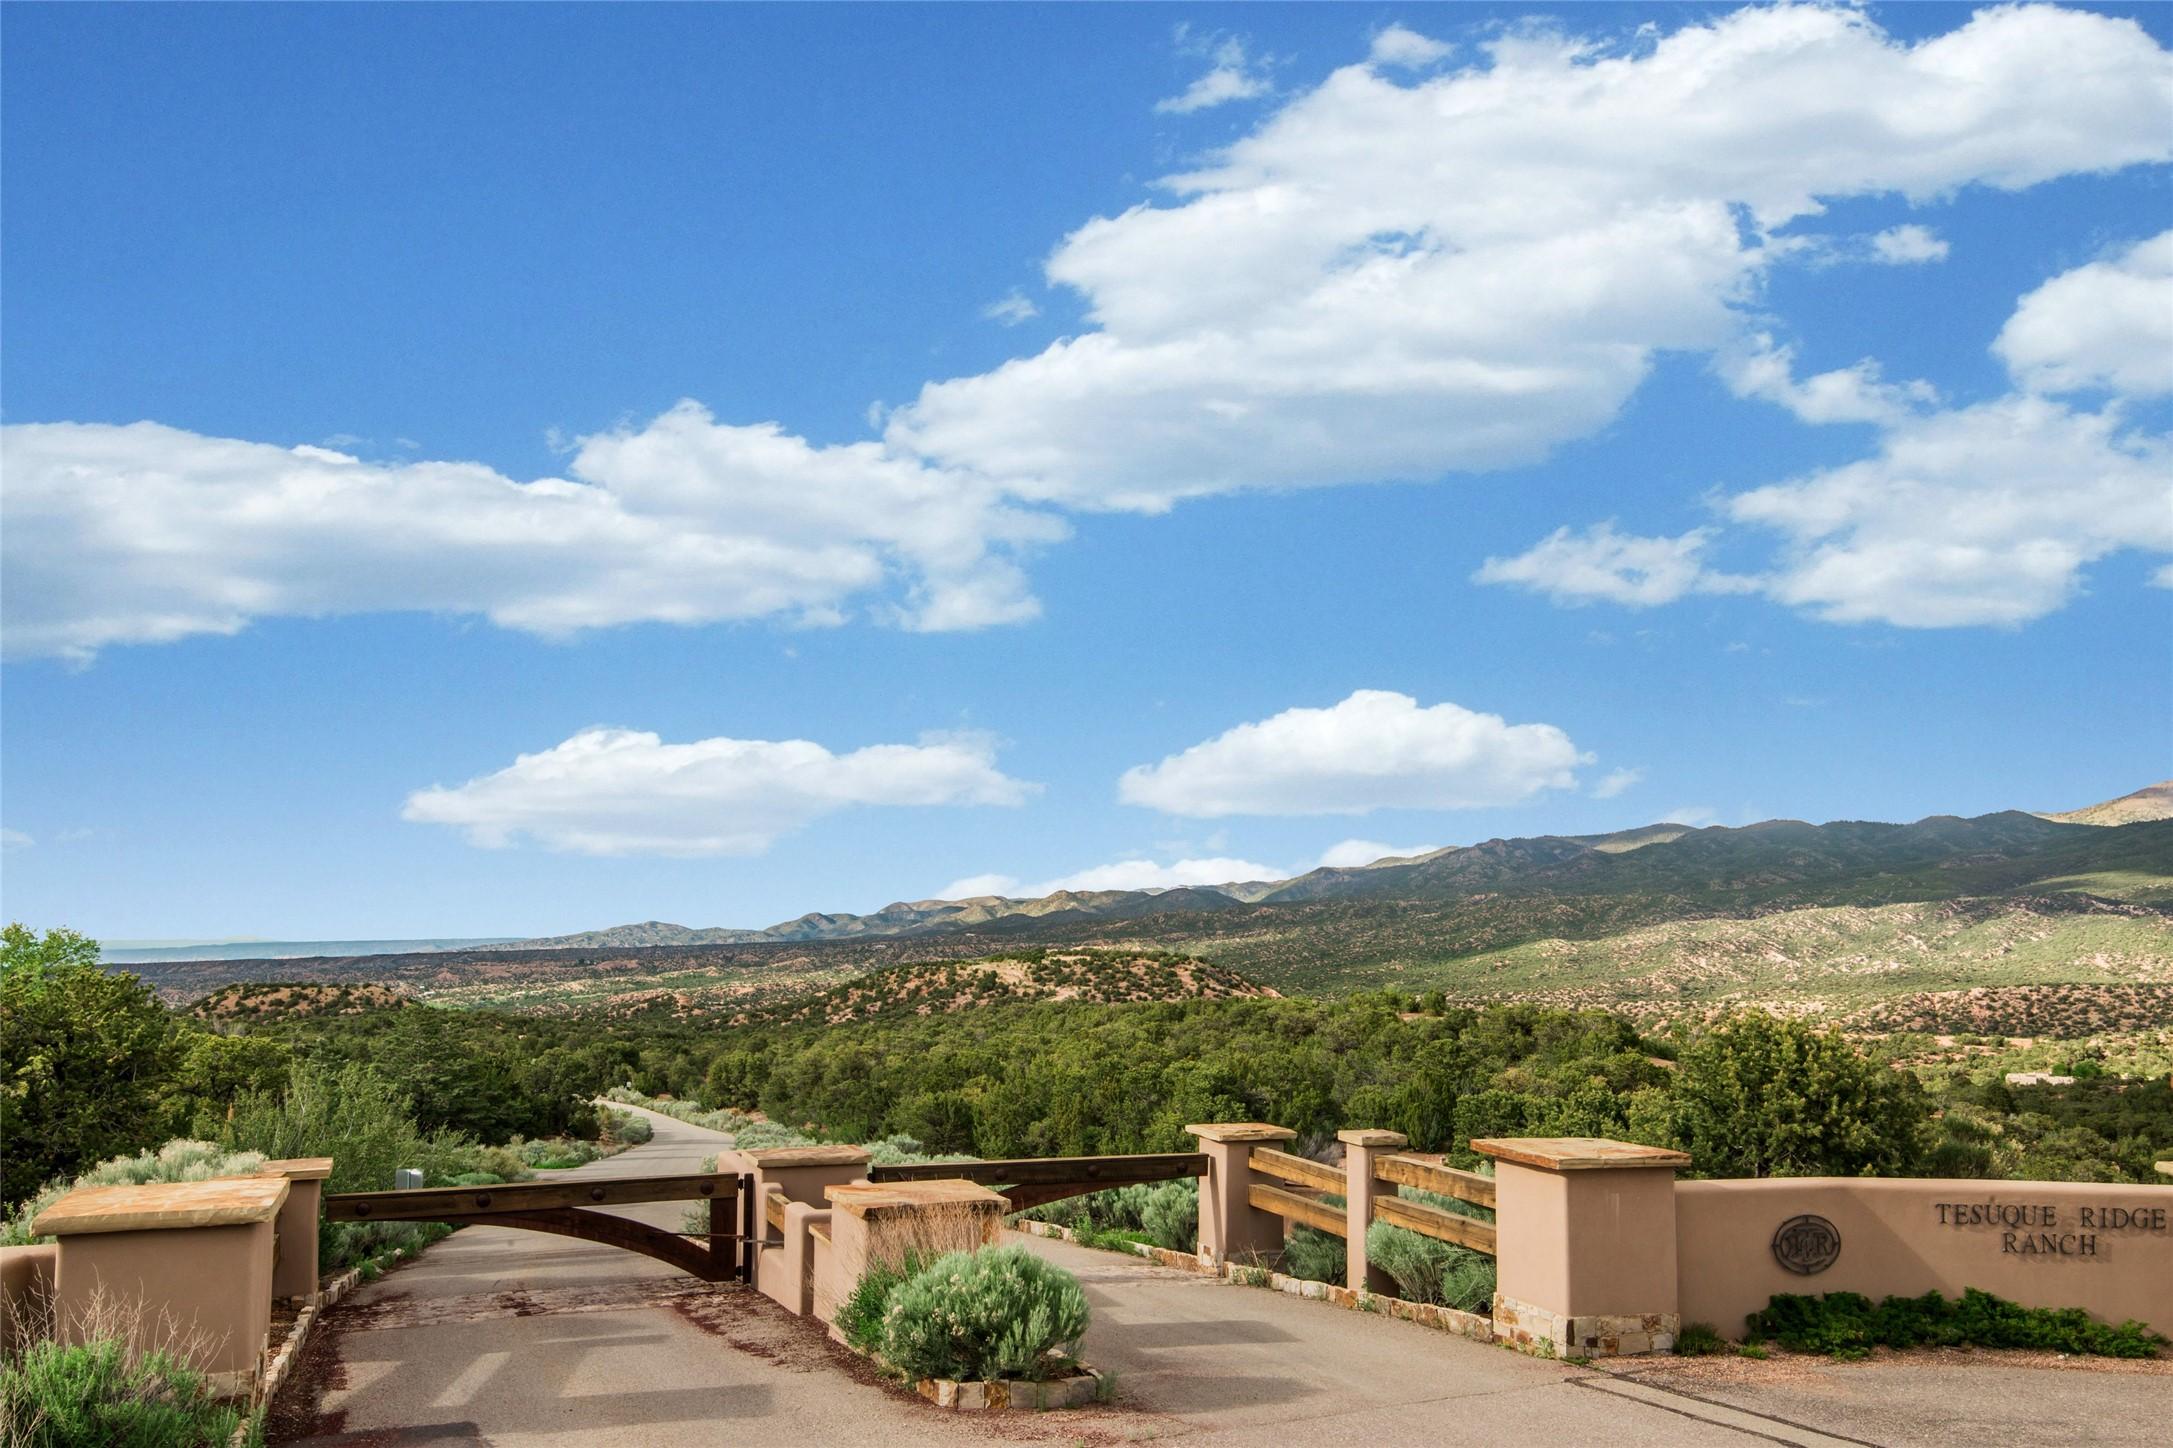 Lot 5, 71 Tesuque Ridge Lot 5, Santa Fe NM 87501 - Photo 2